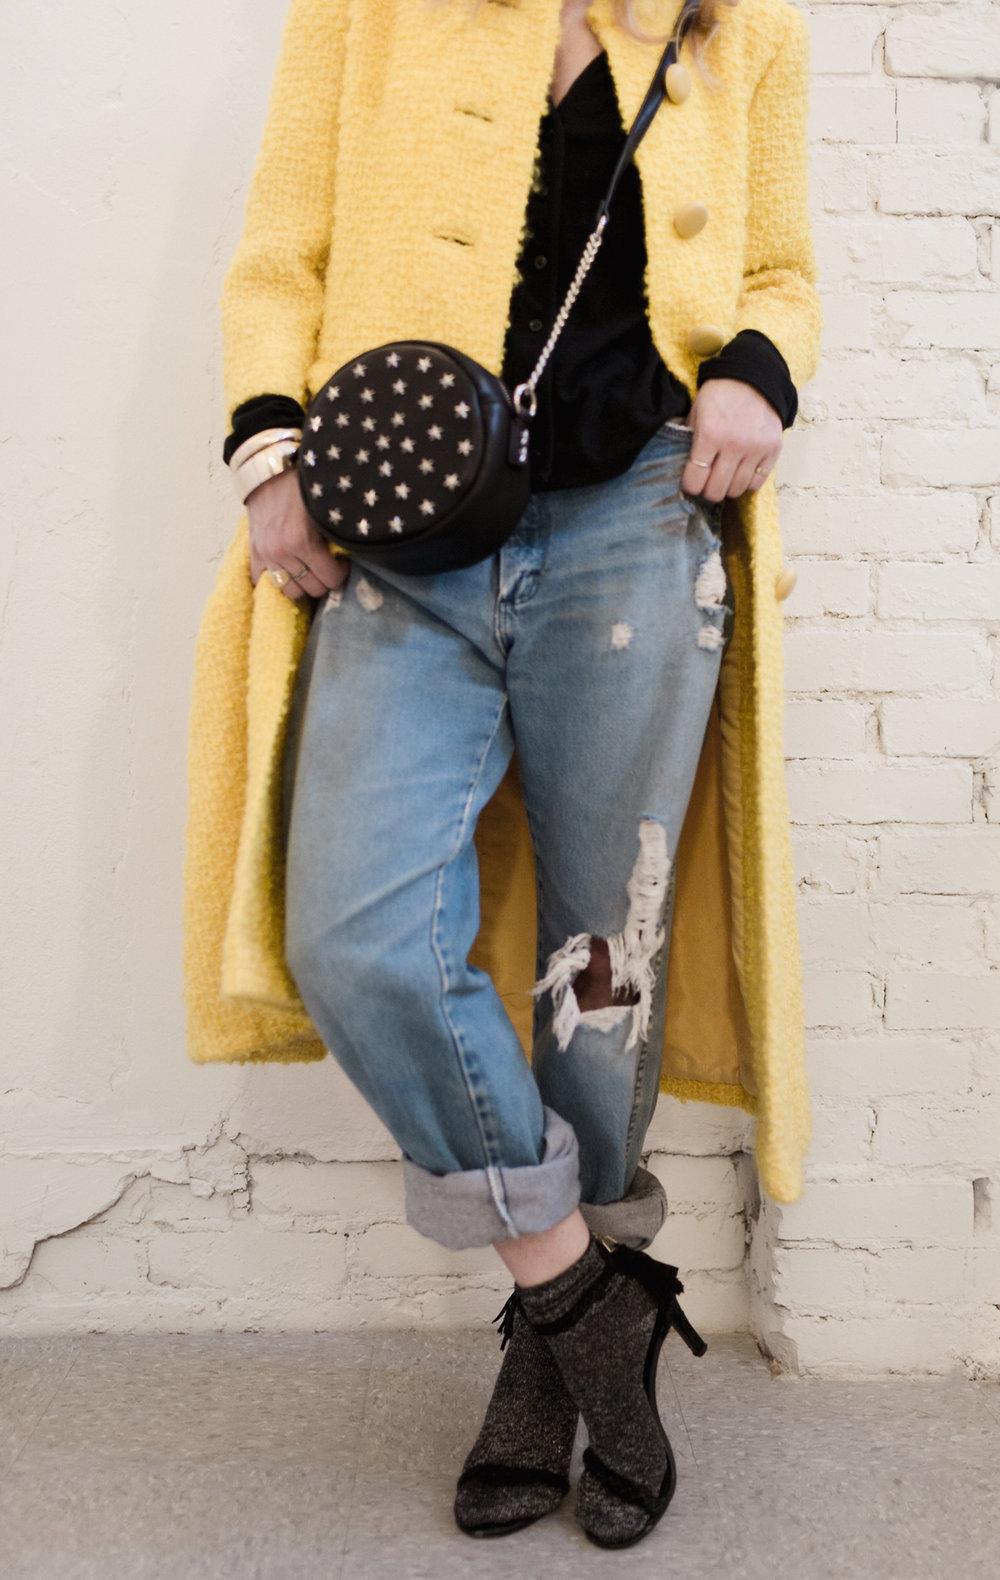 Eldridge Edit_Anna_E_Cottrell_Fashion_Blogger_Yellow_Vintage_Coat_Wrangler_Boyfriend_Jeans_Spring_Trend_2017_Star_Crossbody_Bag_Socks_with_Heels_Trend_MGB_Photo_7.jpg